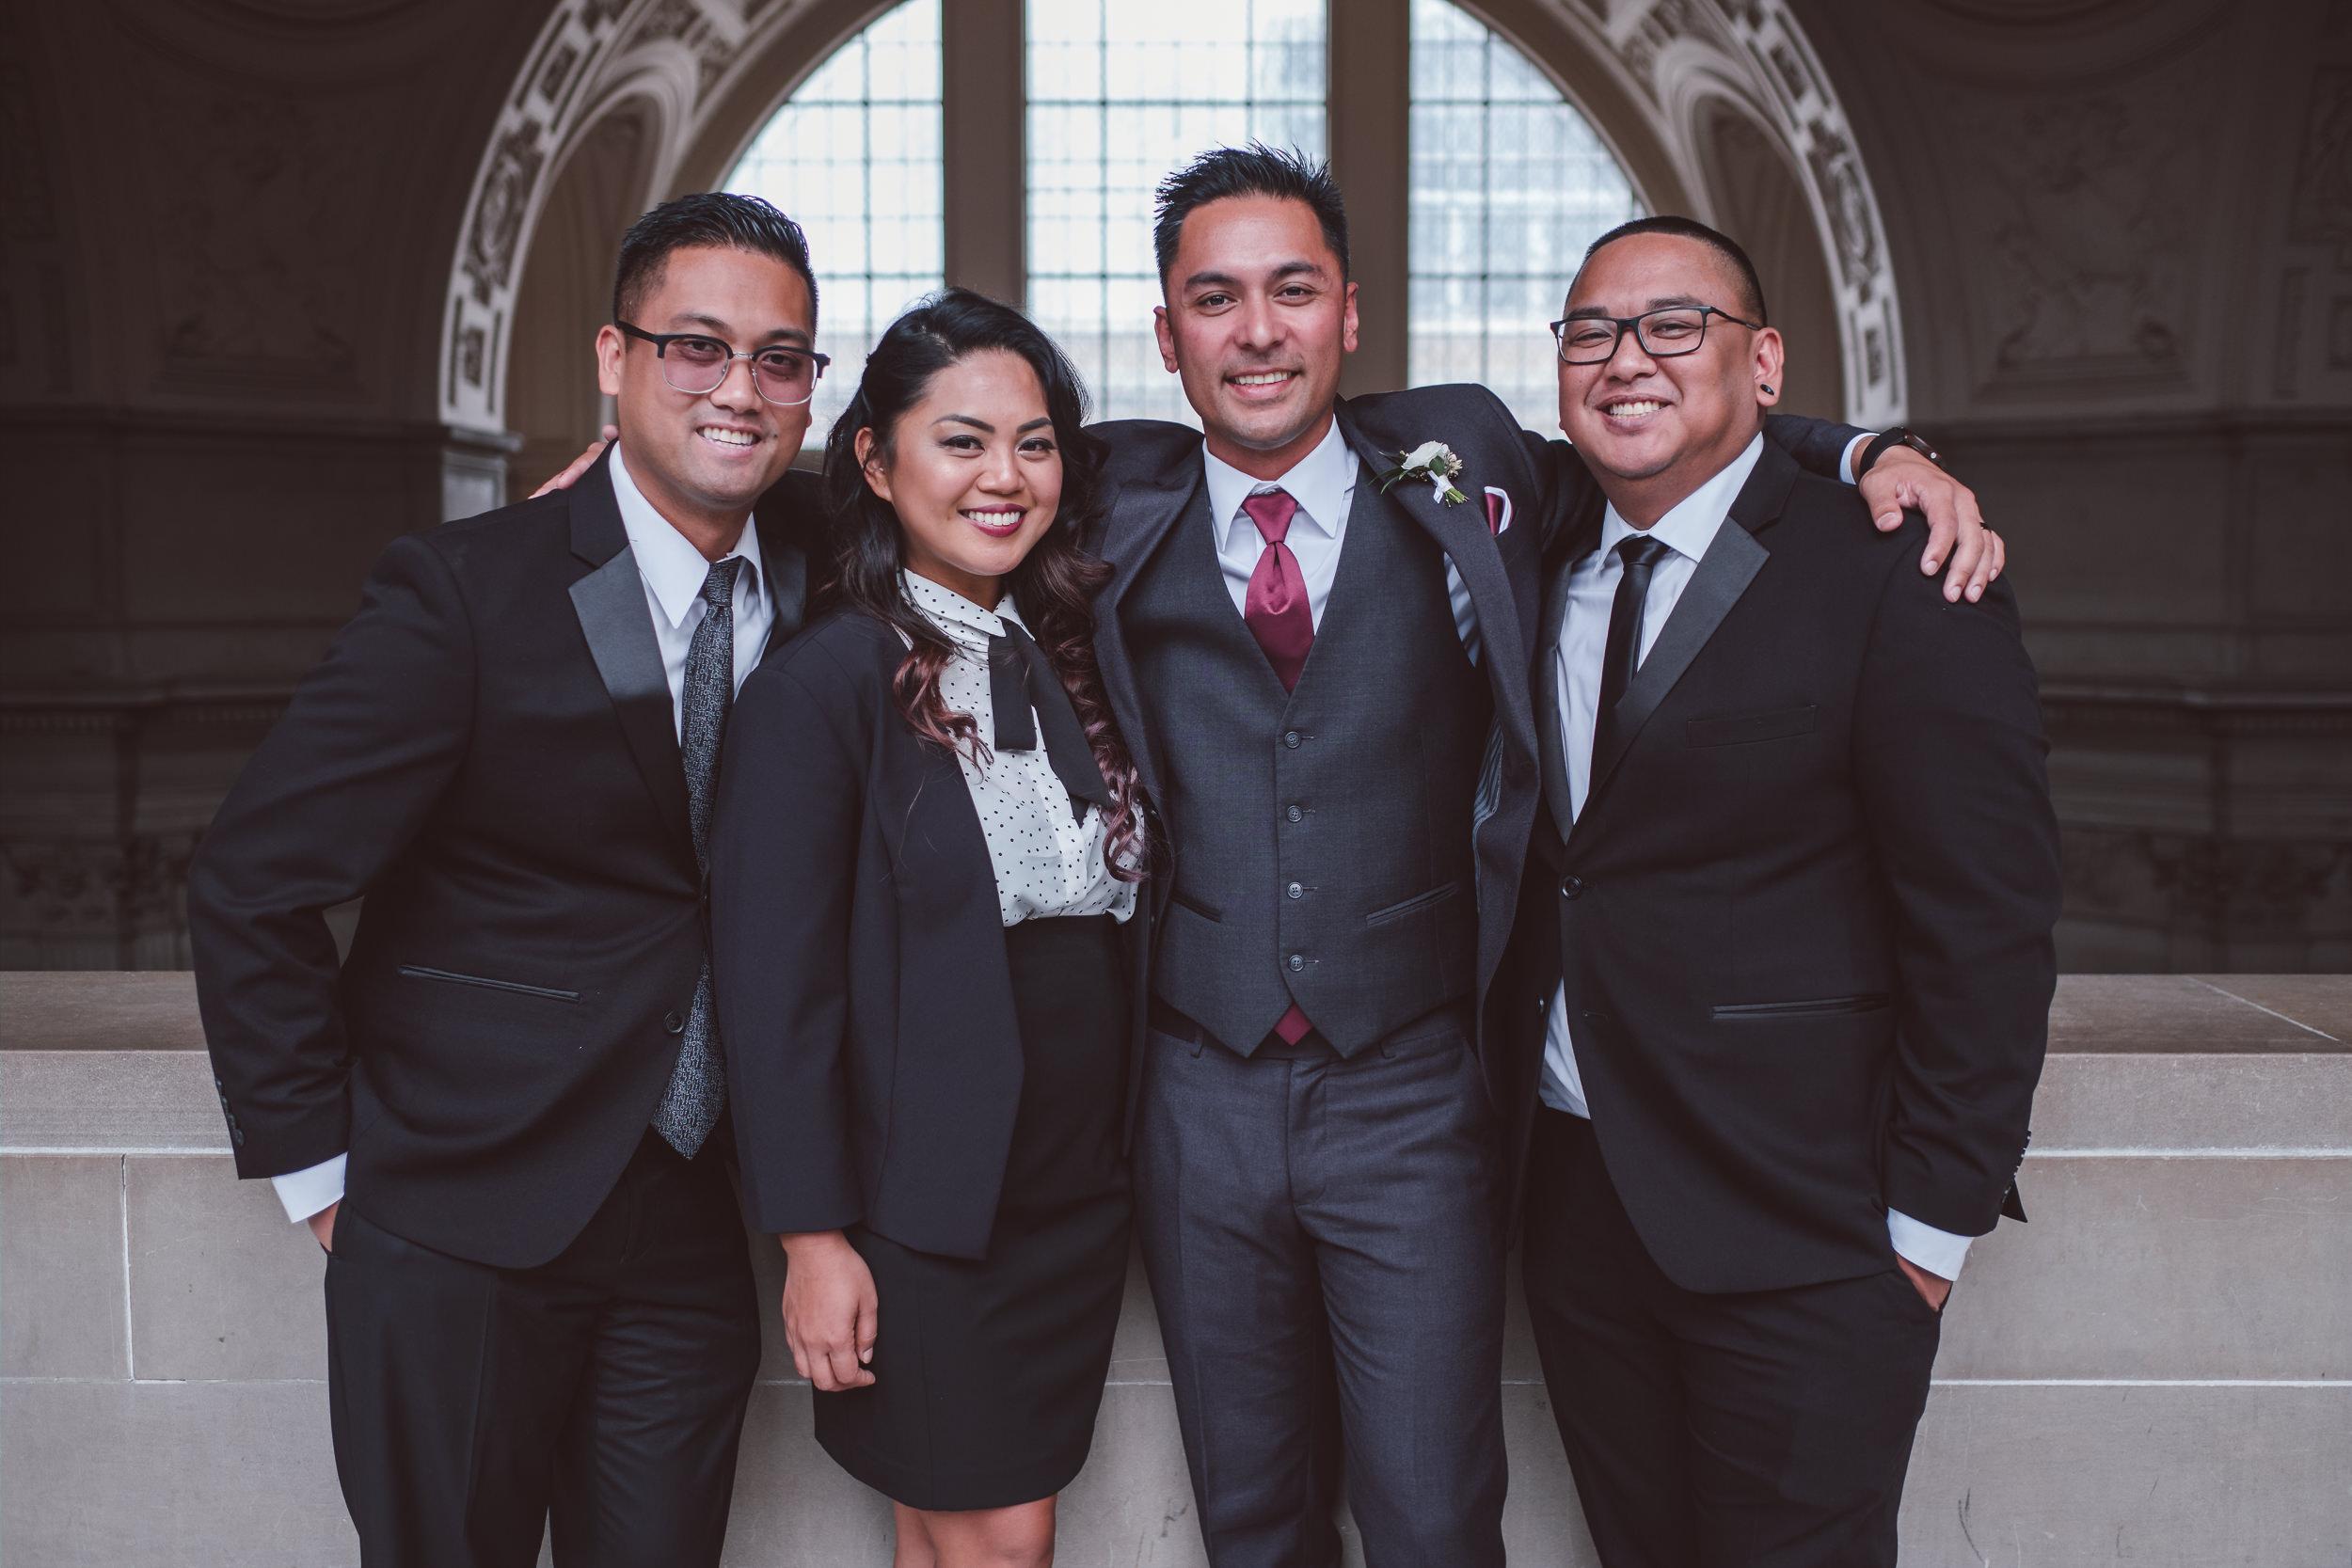 San-Francisco-City-Hall-Wedding-Photography-054.jpg